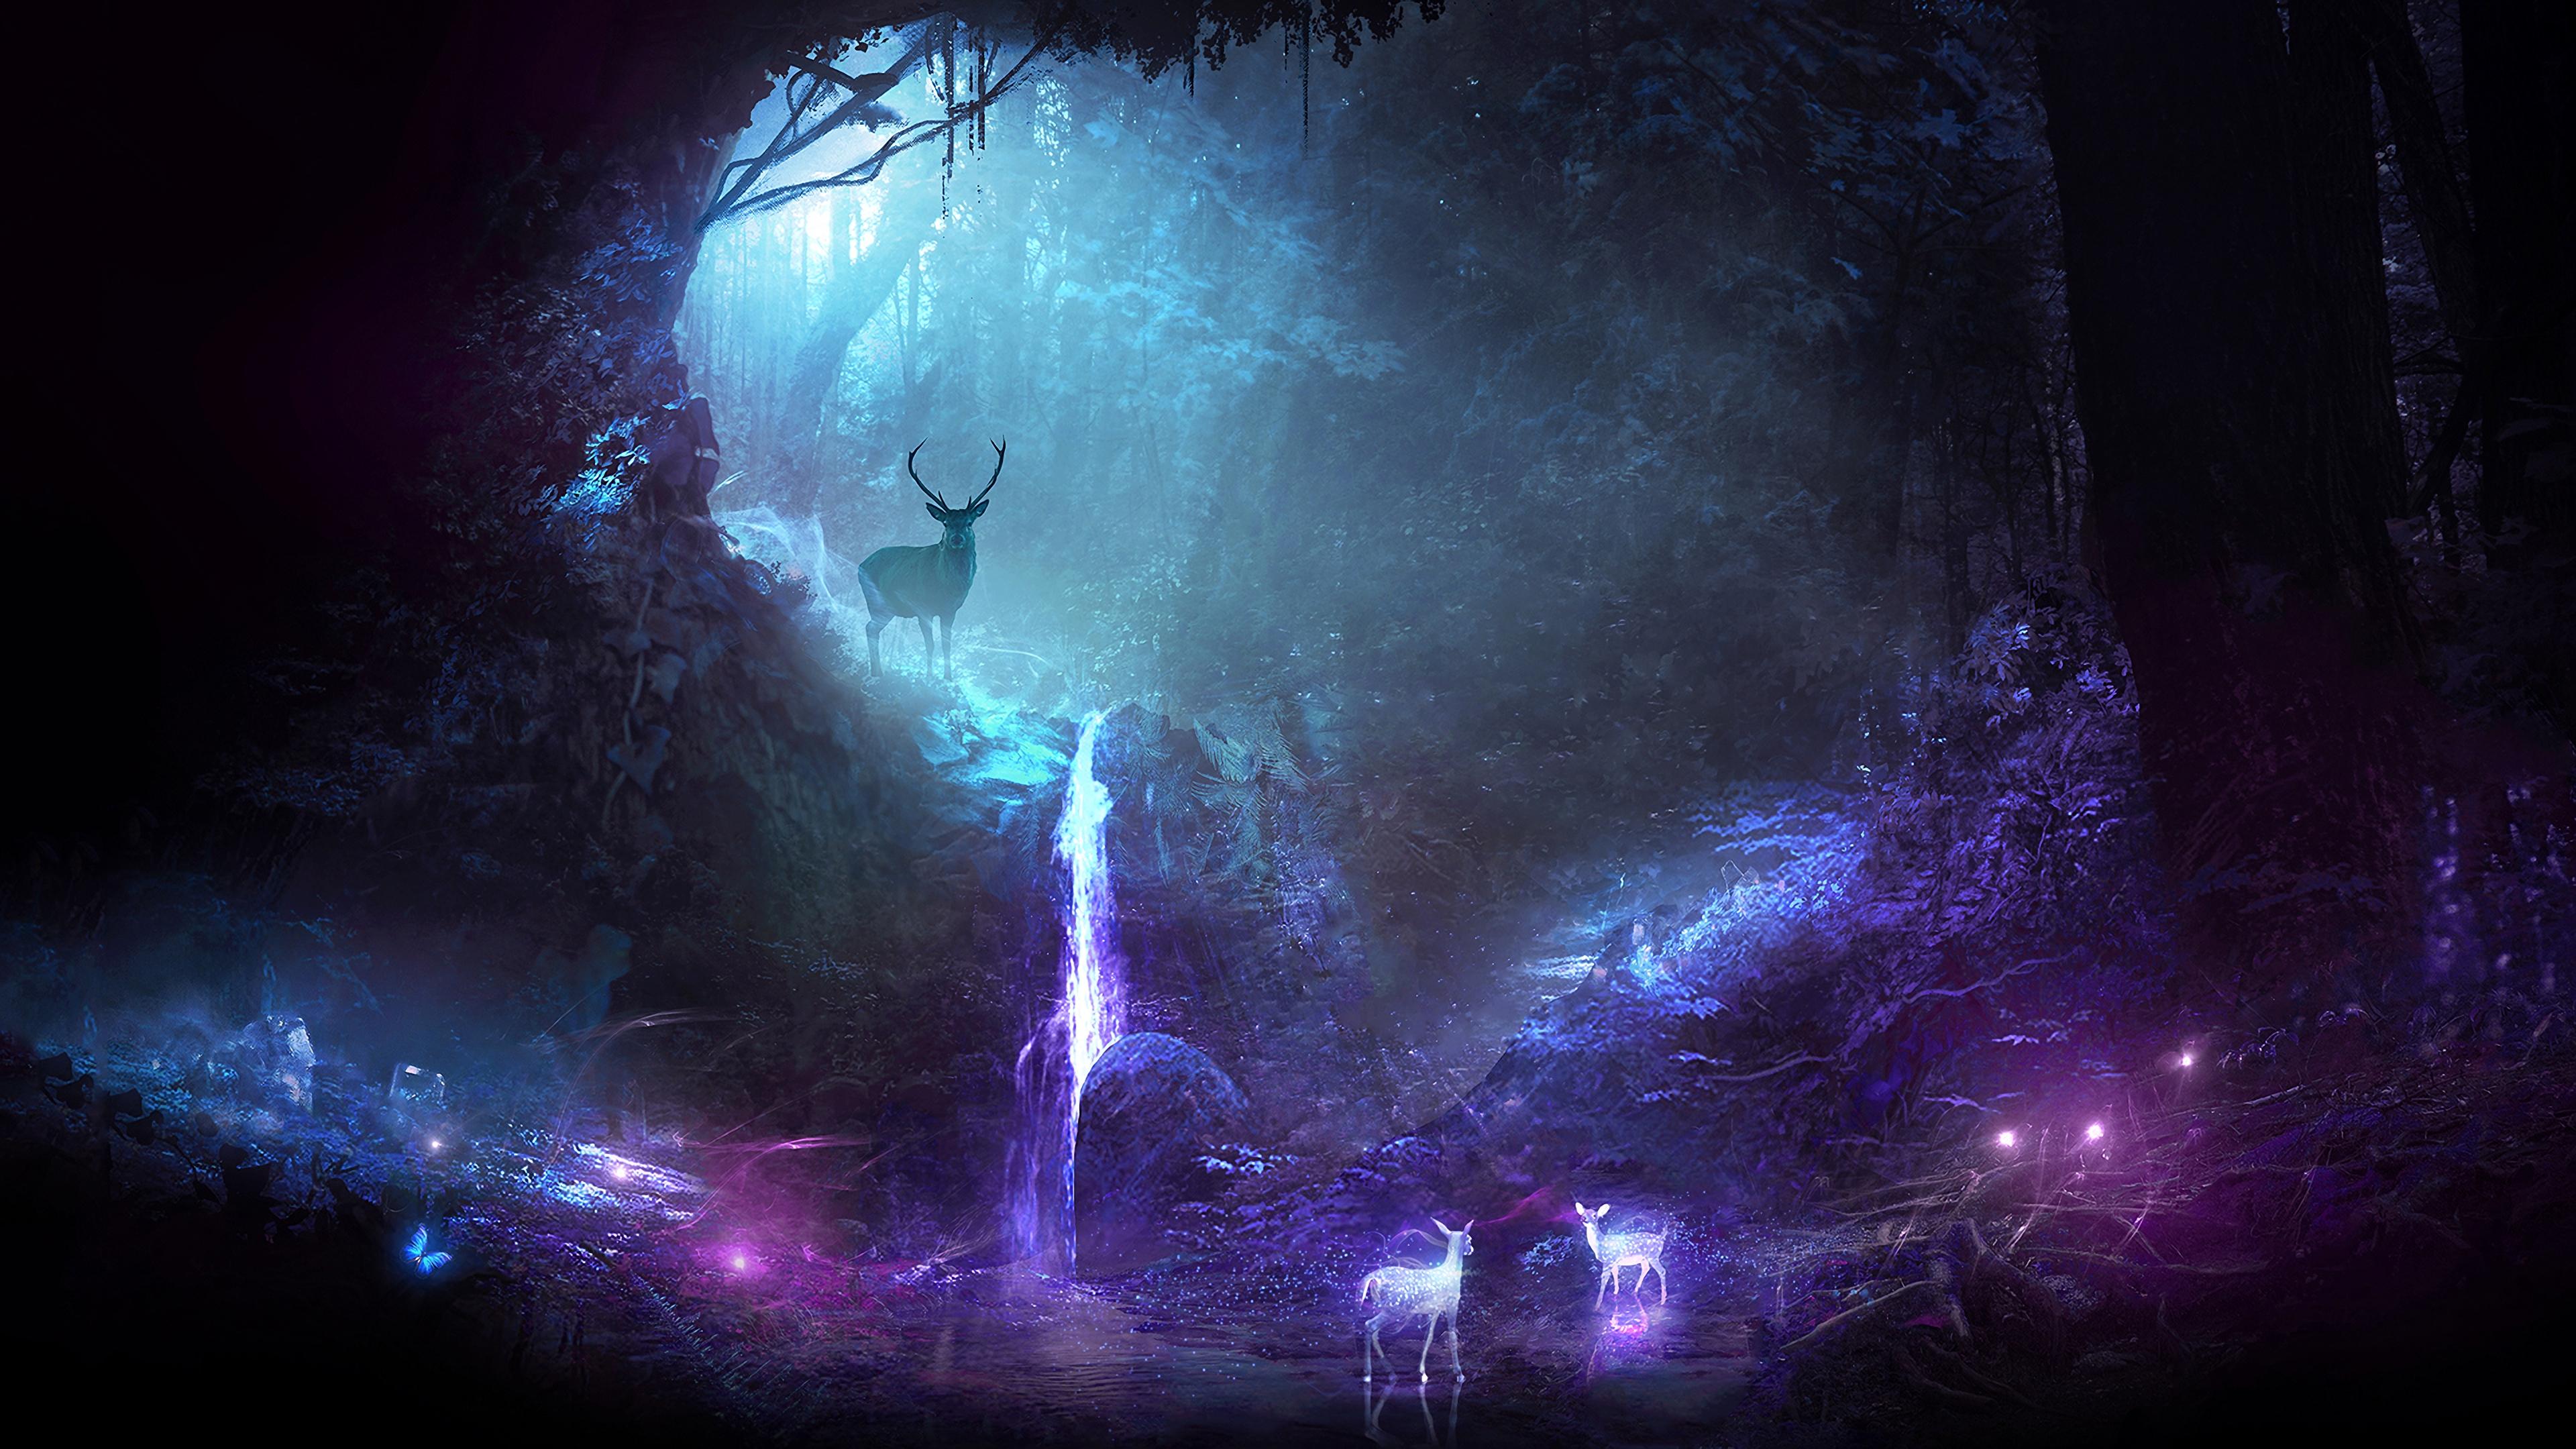 forest deer cave lights 4k 1541971483 - forest, deer, cave, lights 4k - Forest, Deer, Cave